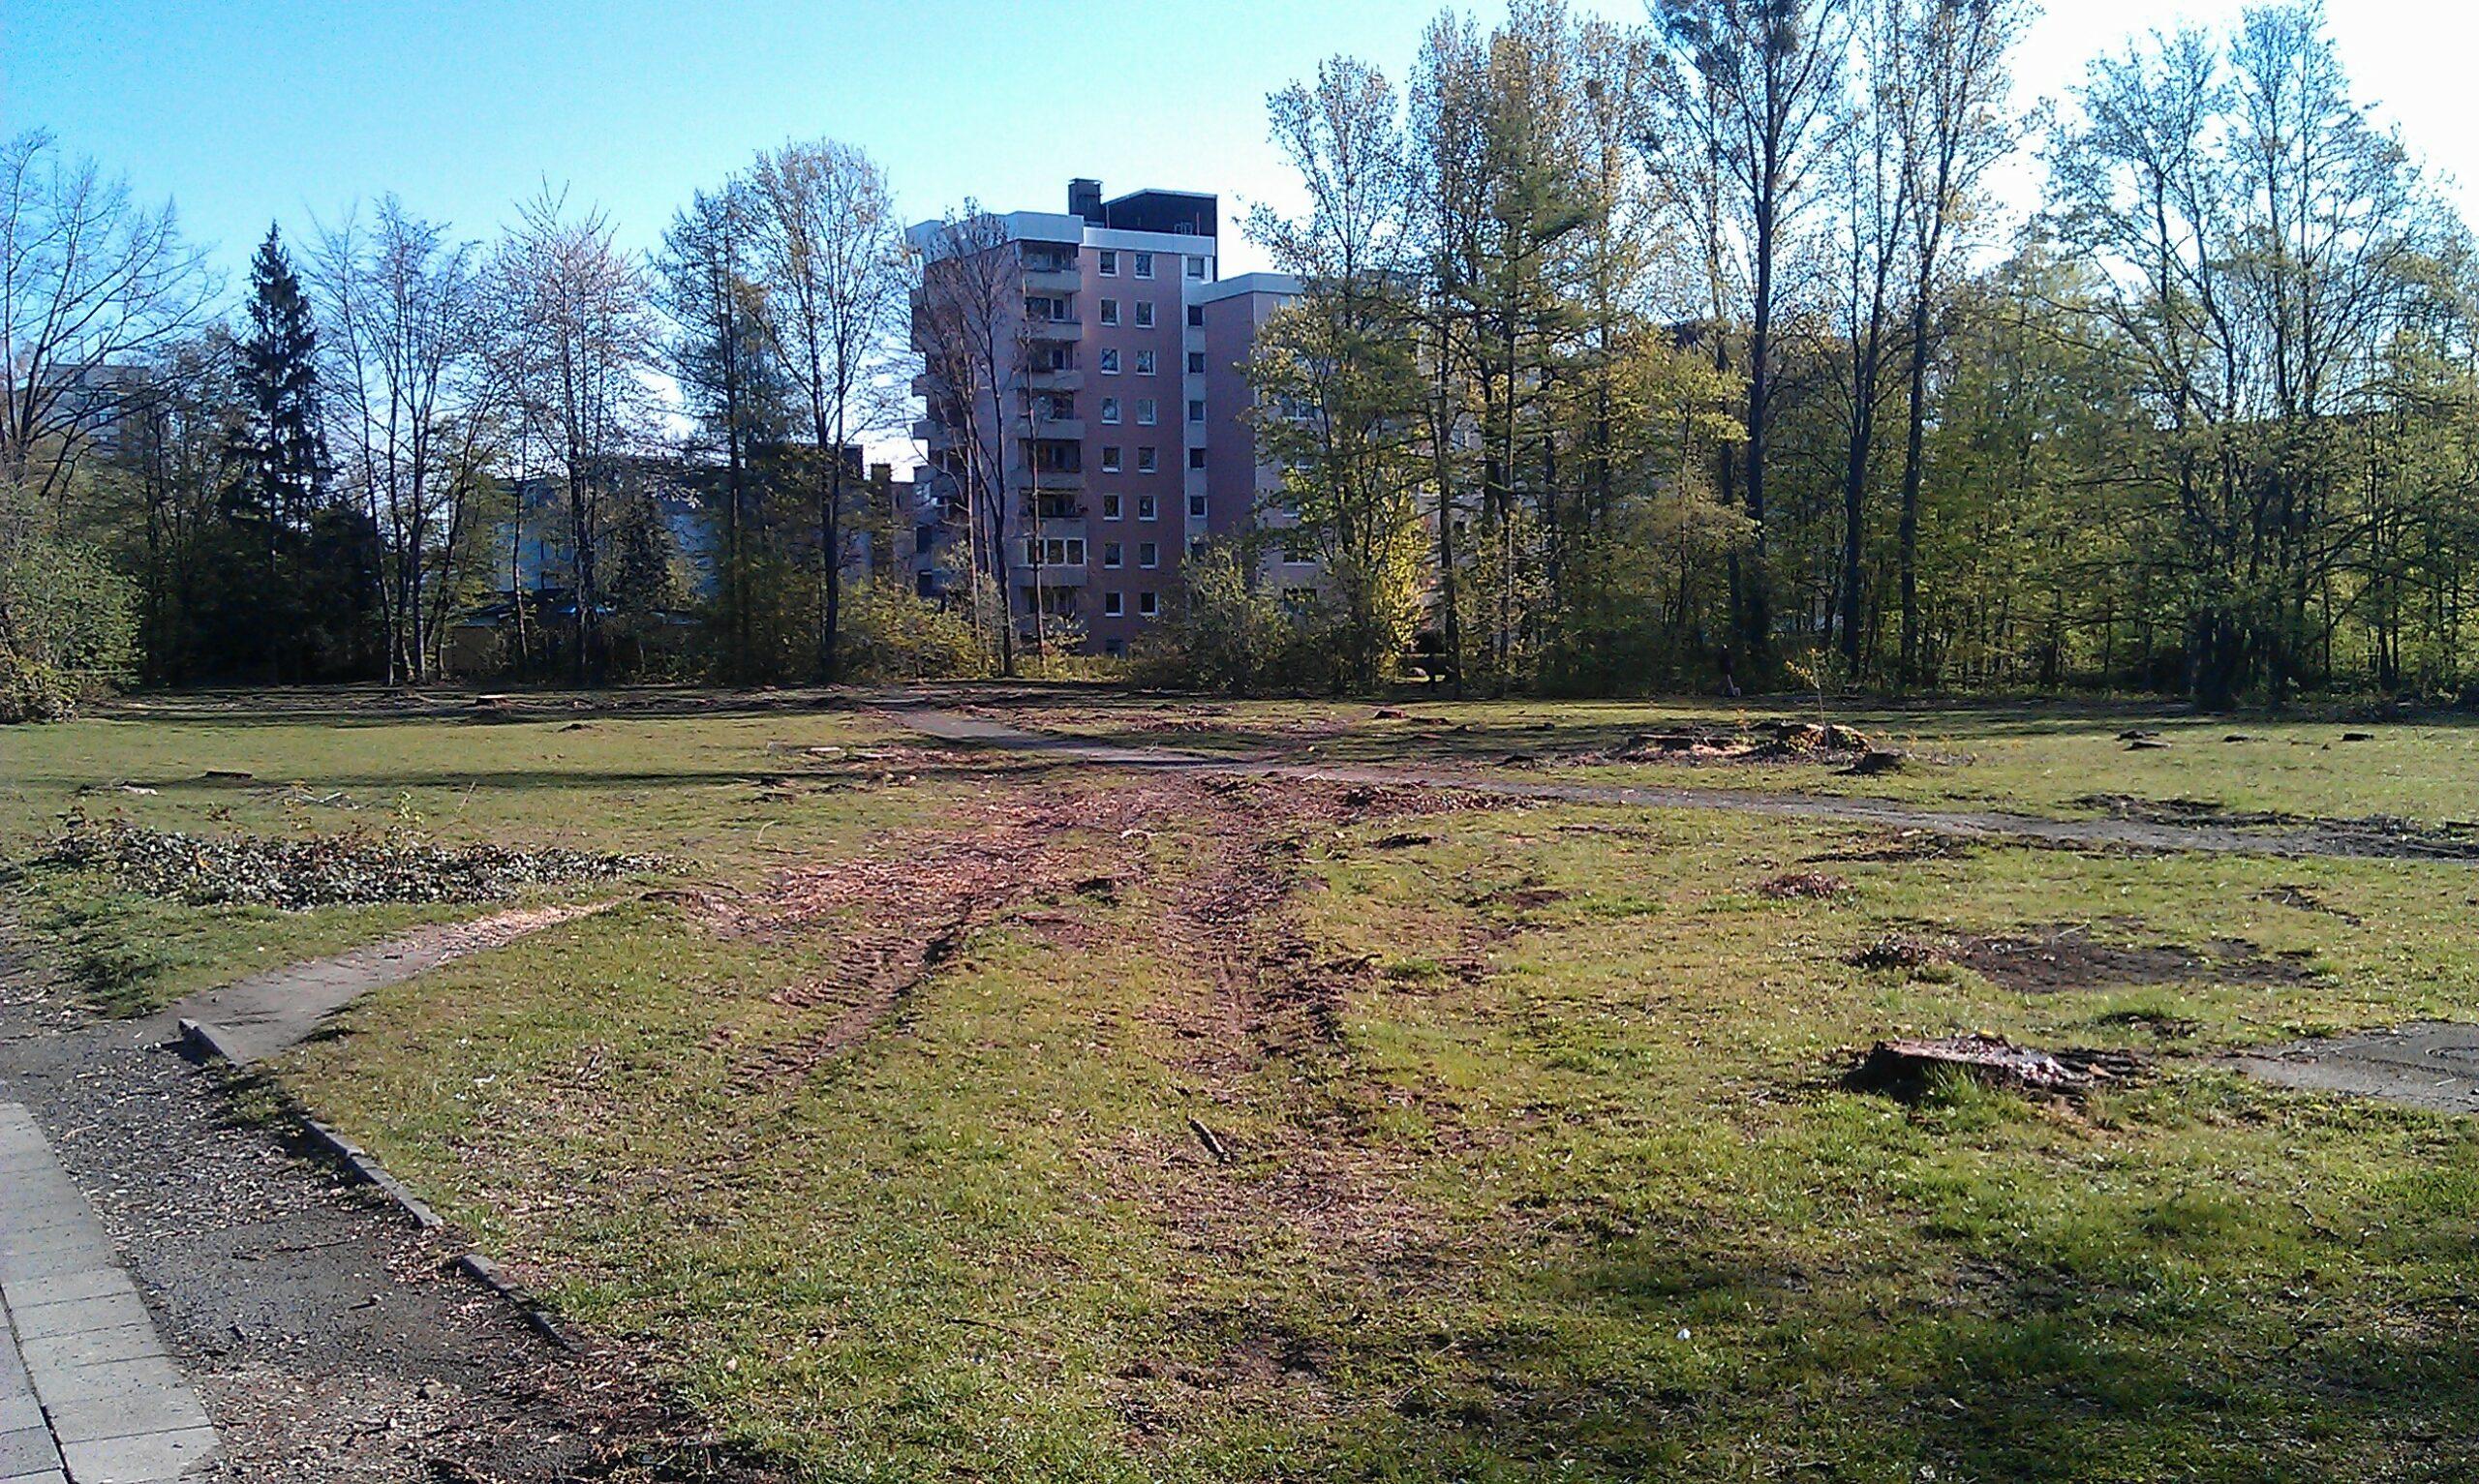 Abholzung Bürgerpark: Ratsfraktion lässt nicht locker